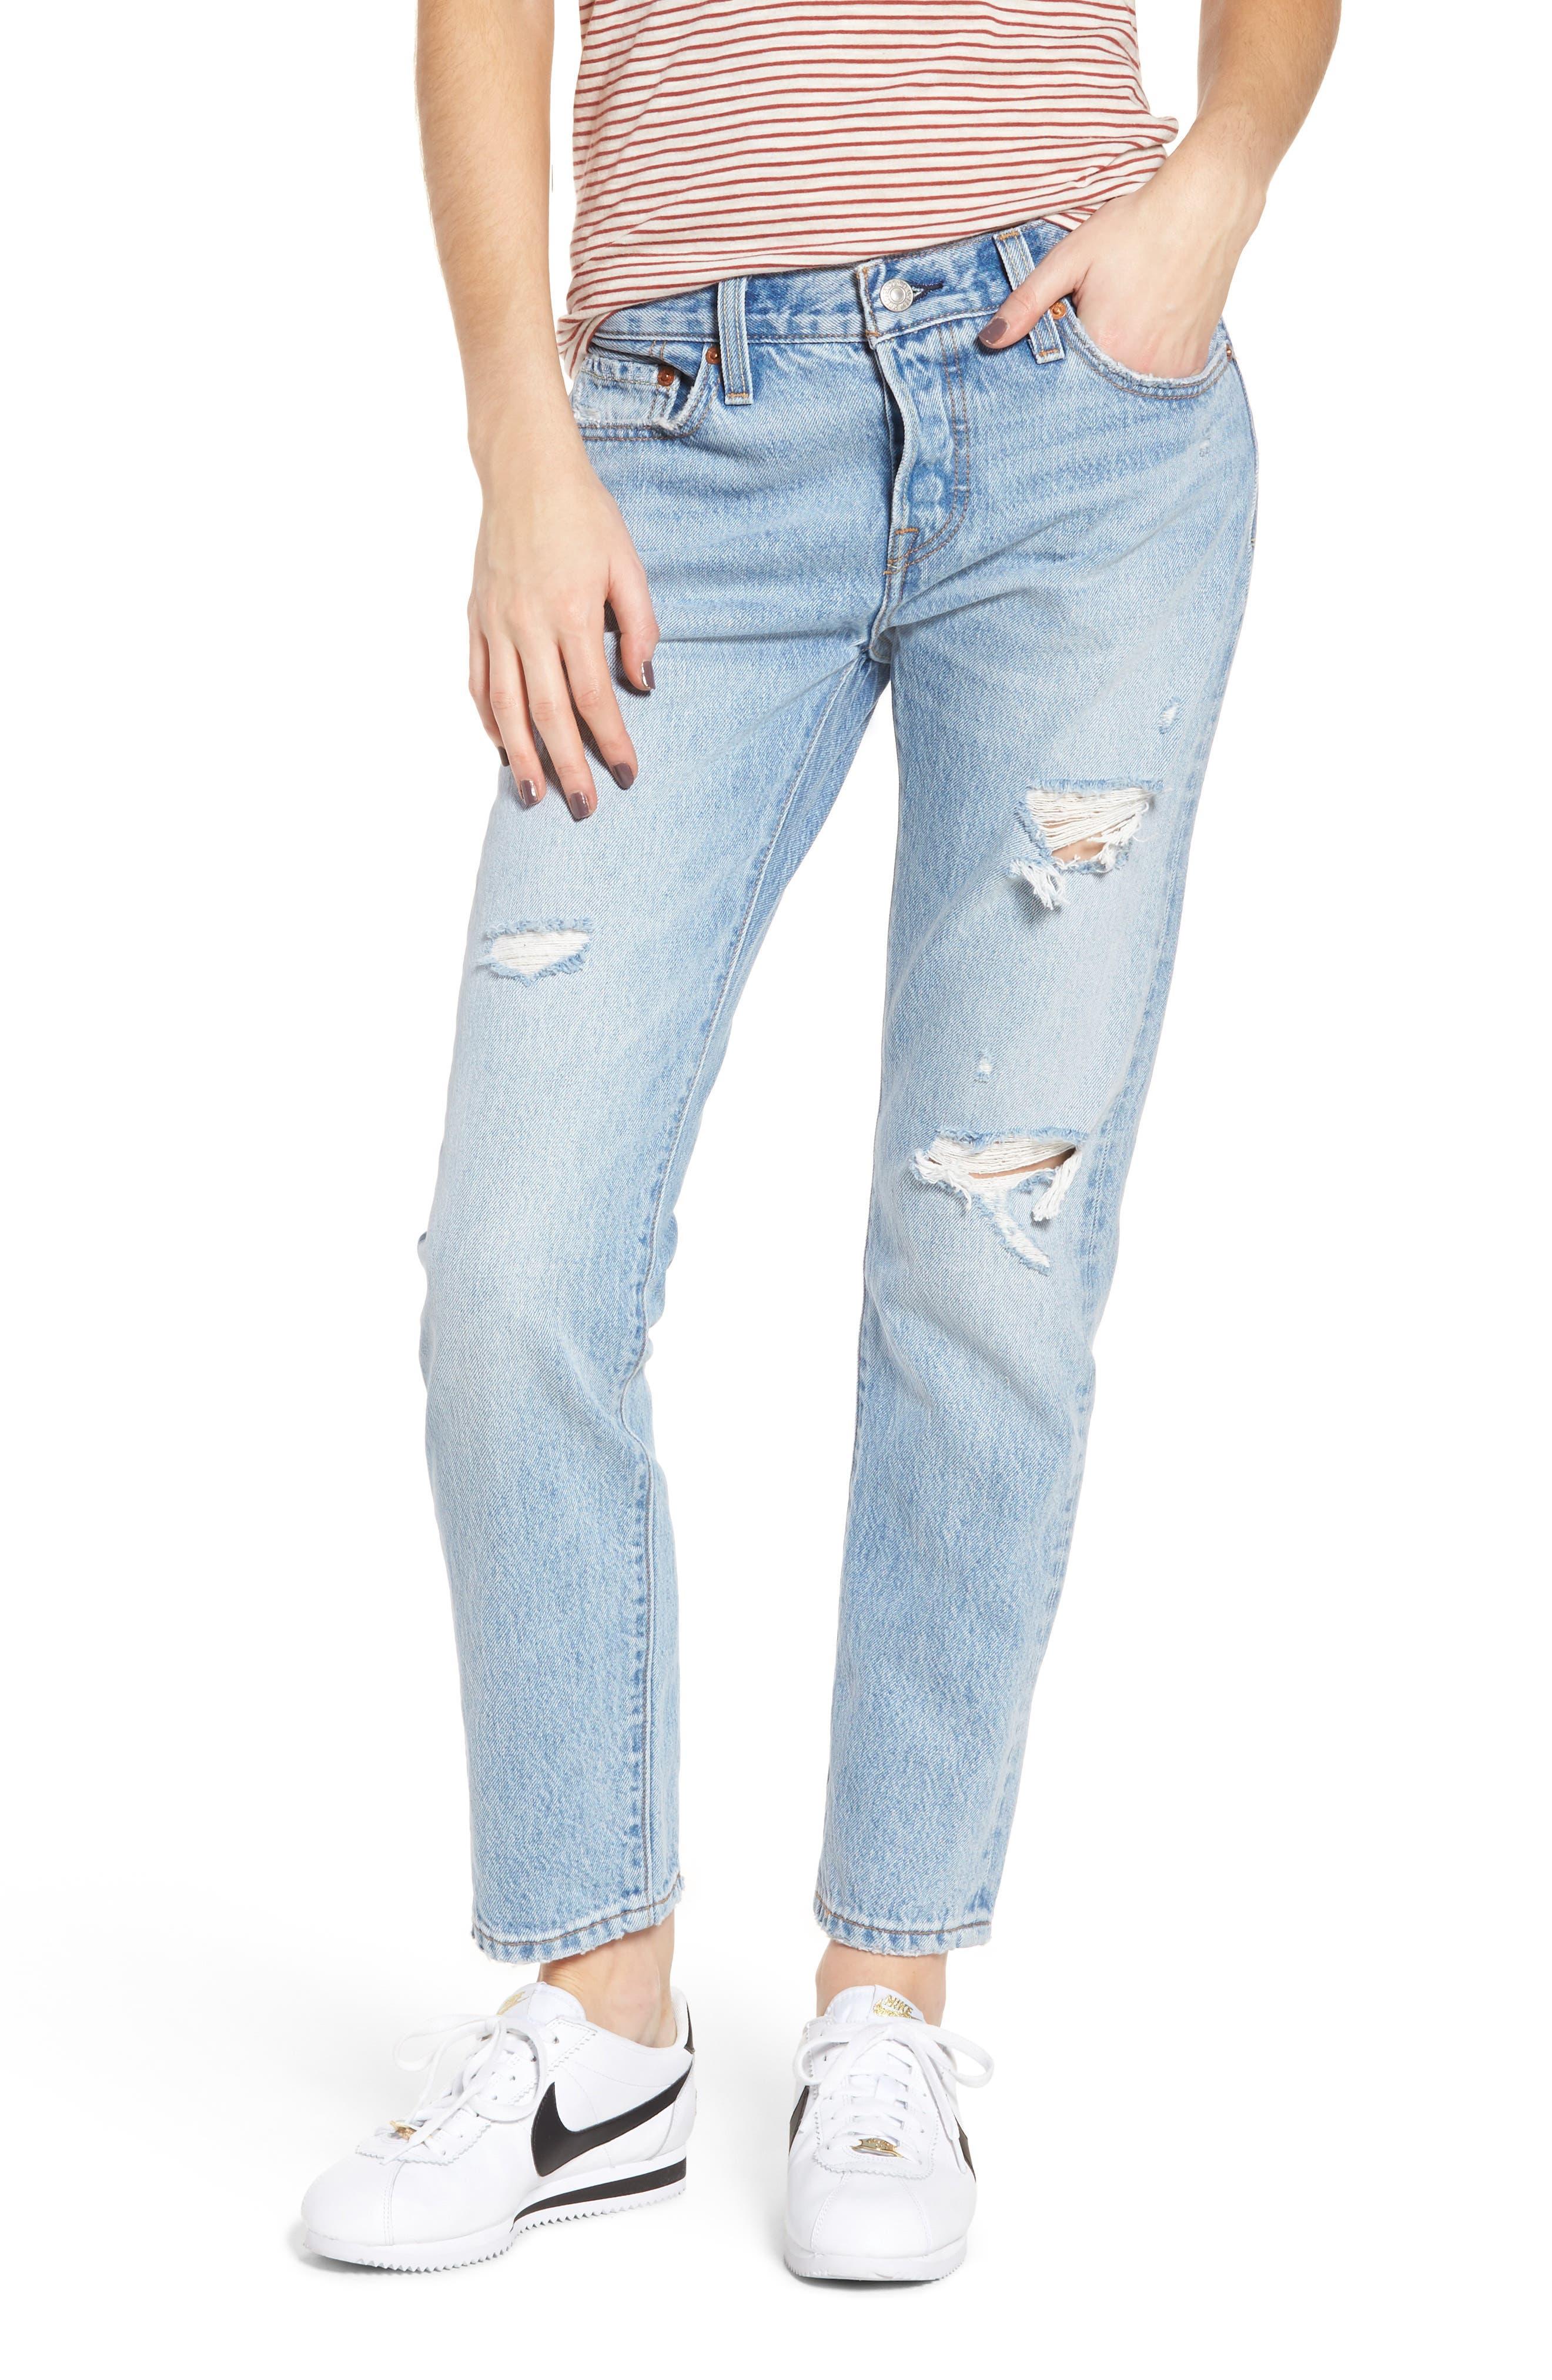 Main Image - Levi's® 501® Boyfriend Jeans (So Called Life)